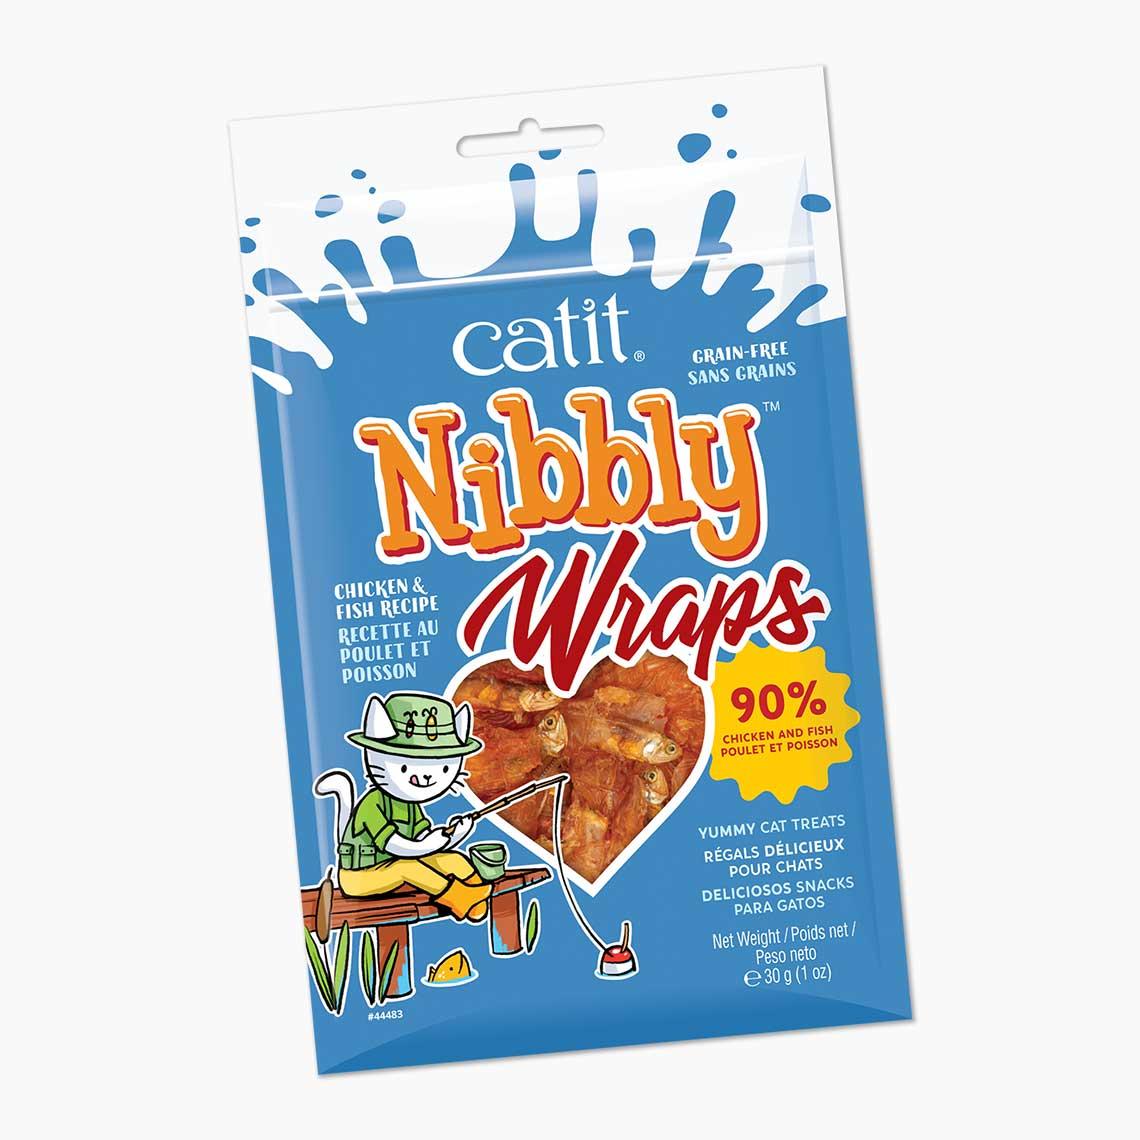 Catit Nibbly Wraps